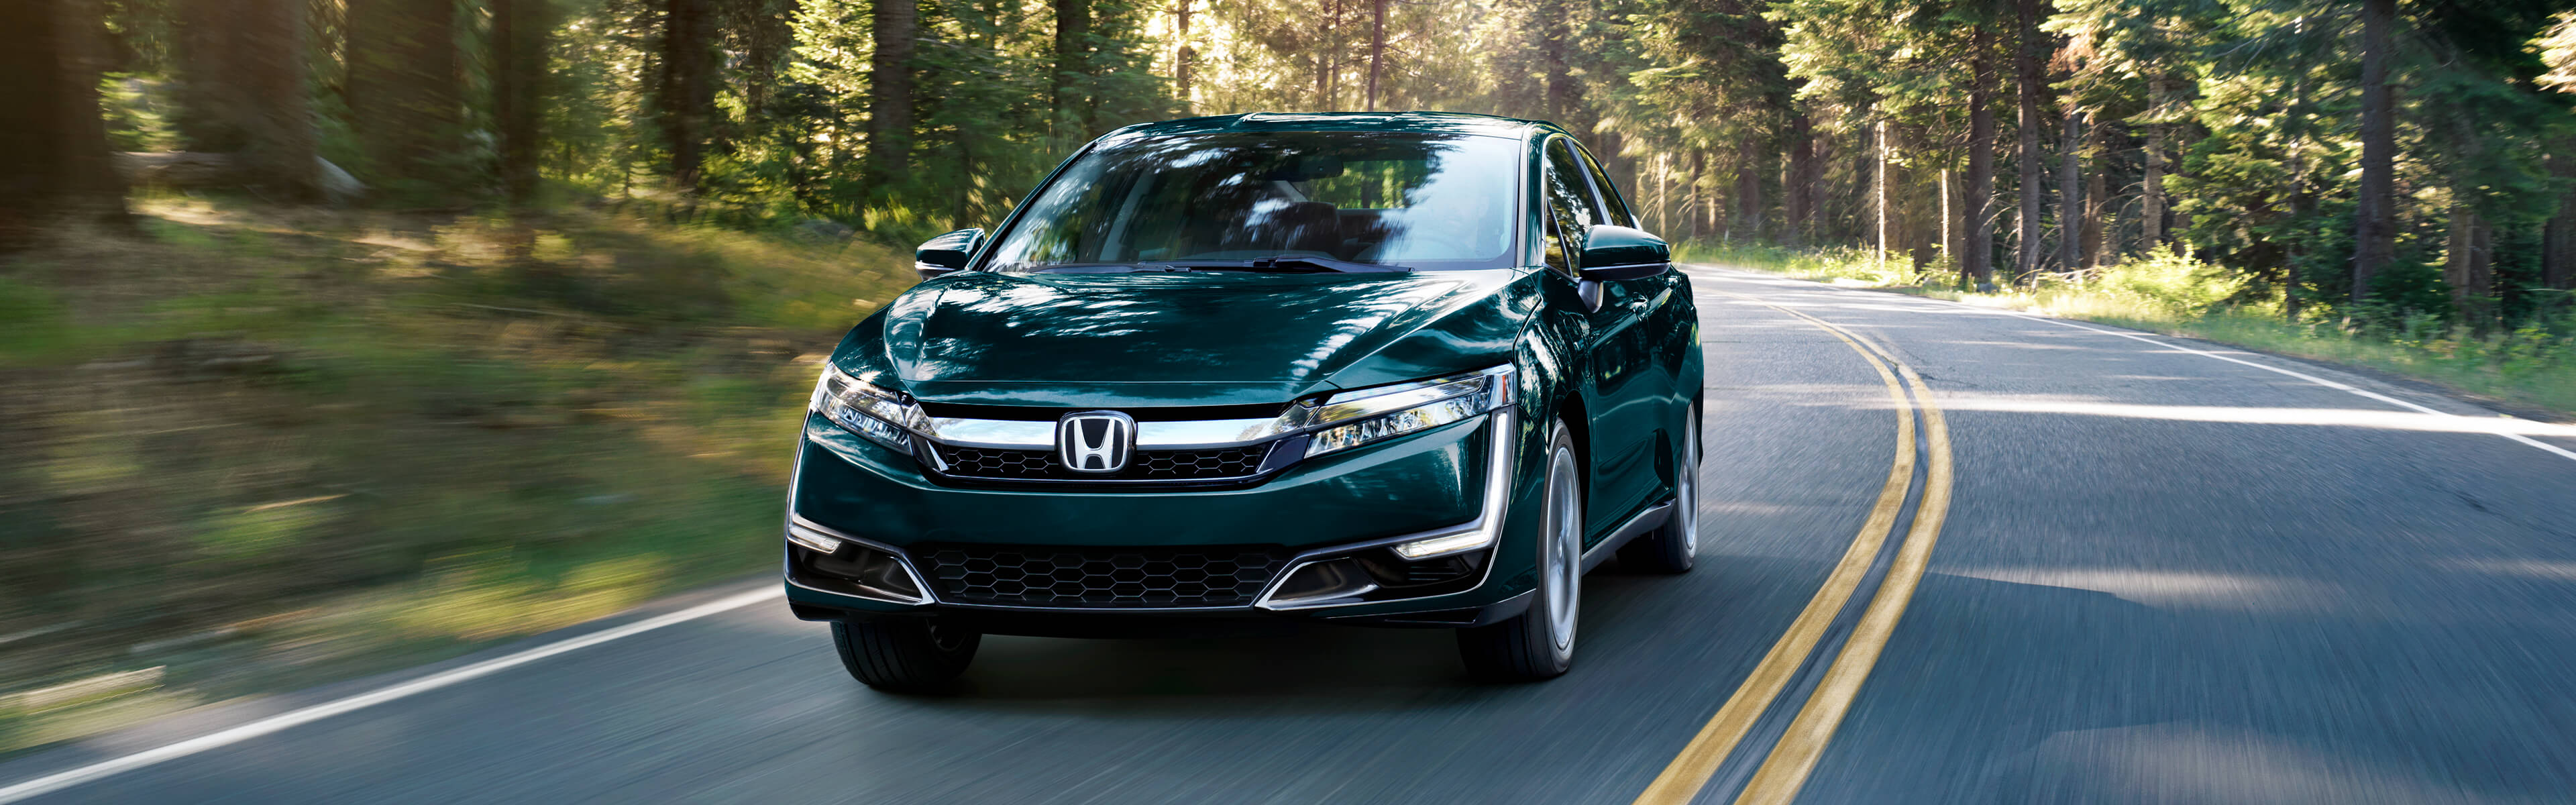 Honda Clarity Arrives in Canada